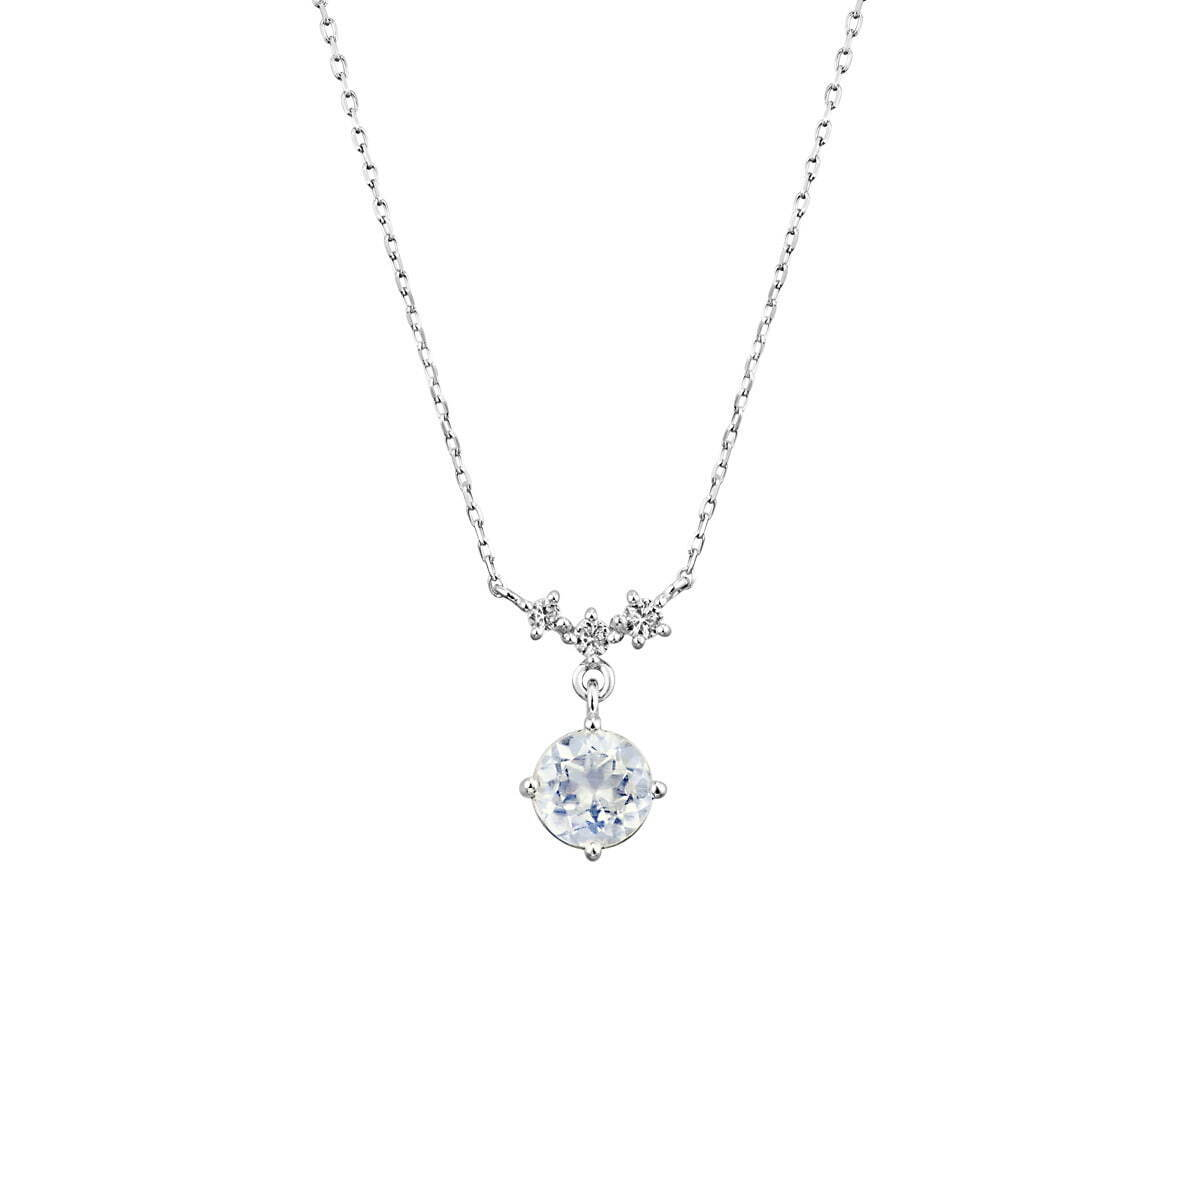 K10WG Necklace/Feldspar/Topaz 23,000円+税